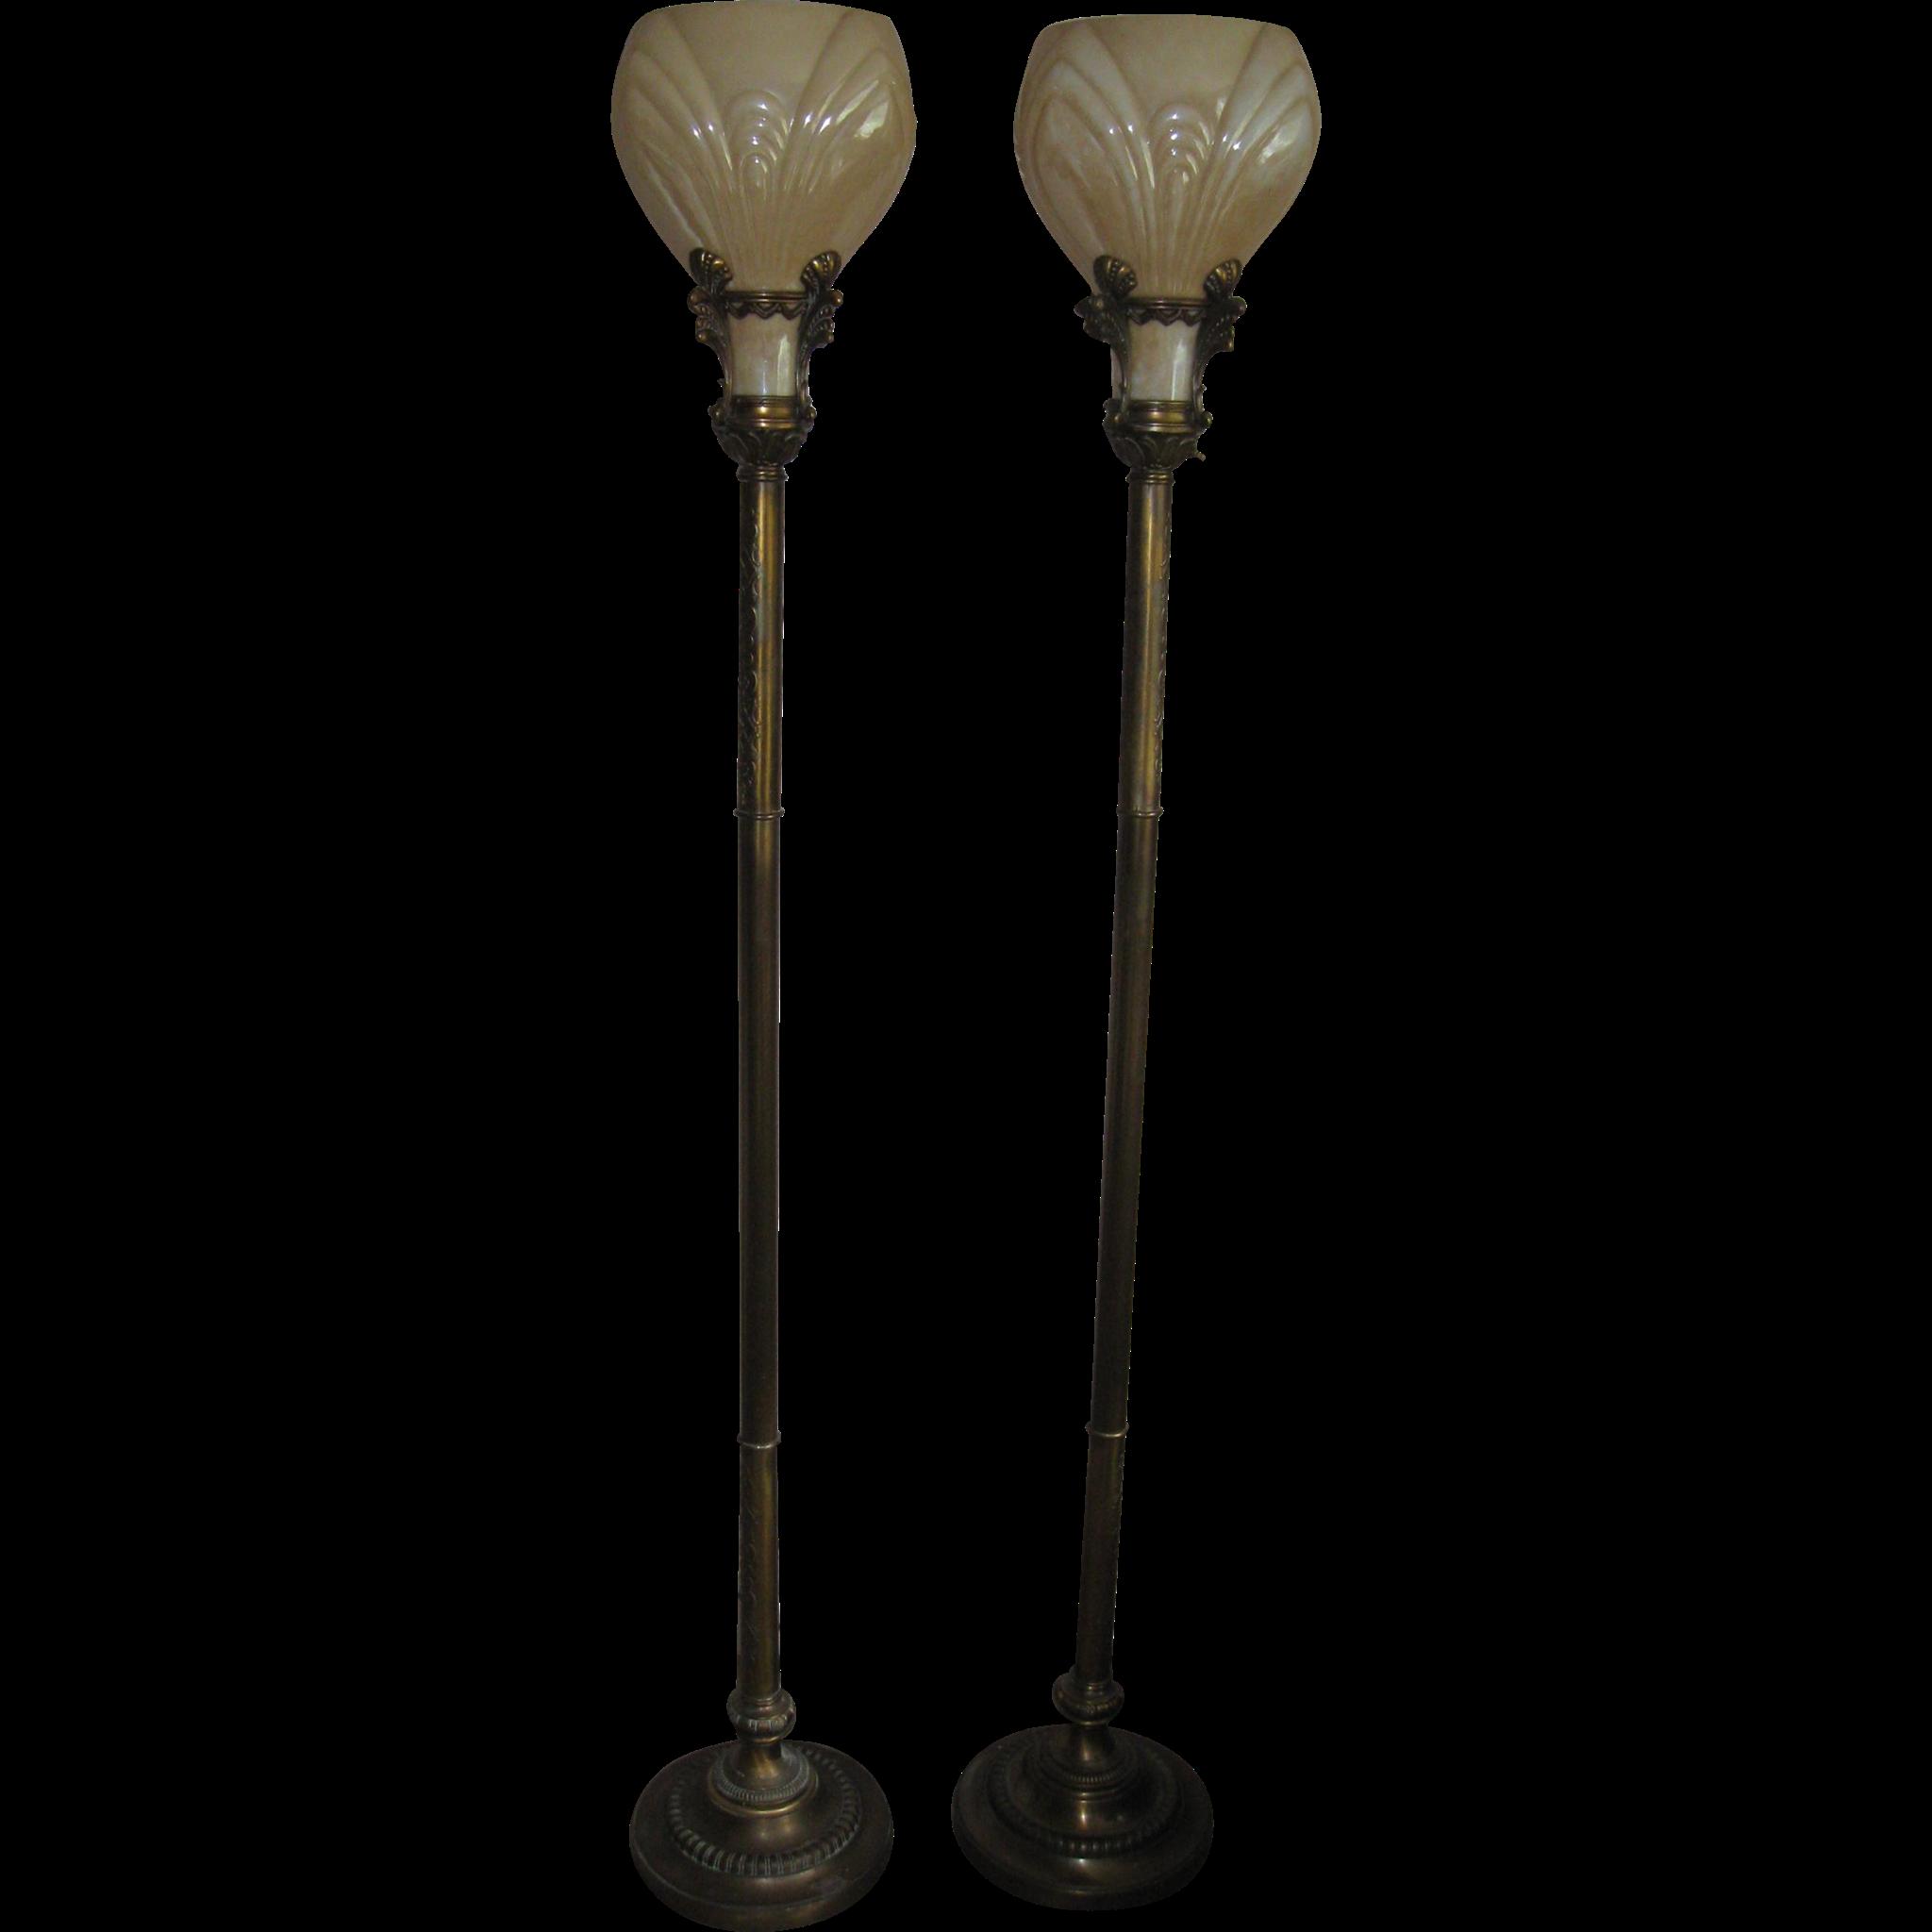 SALE Pair of American Deco Torchiere Floor Lamp's